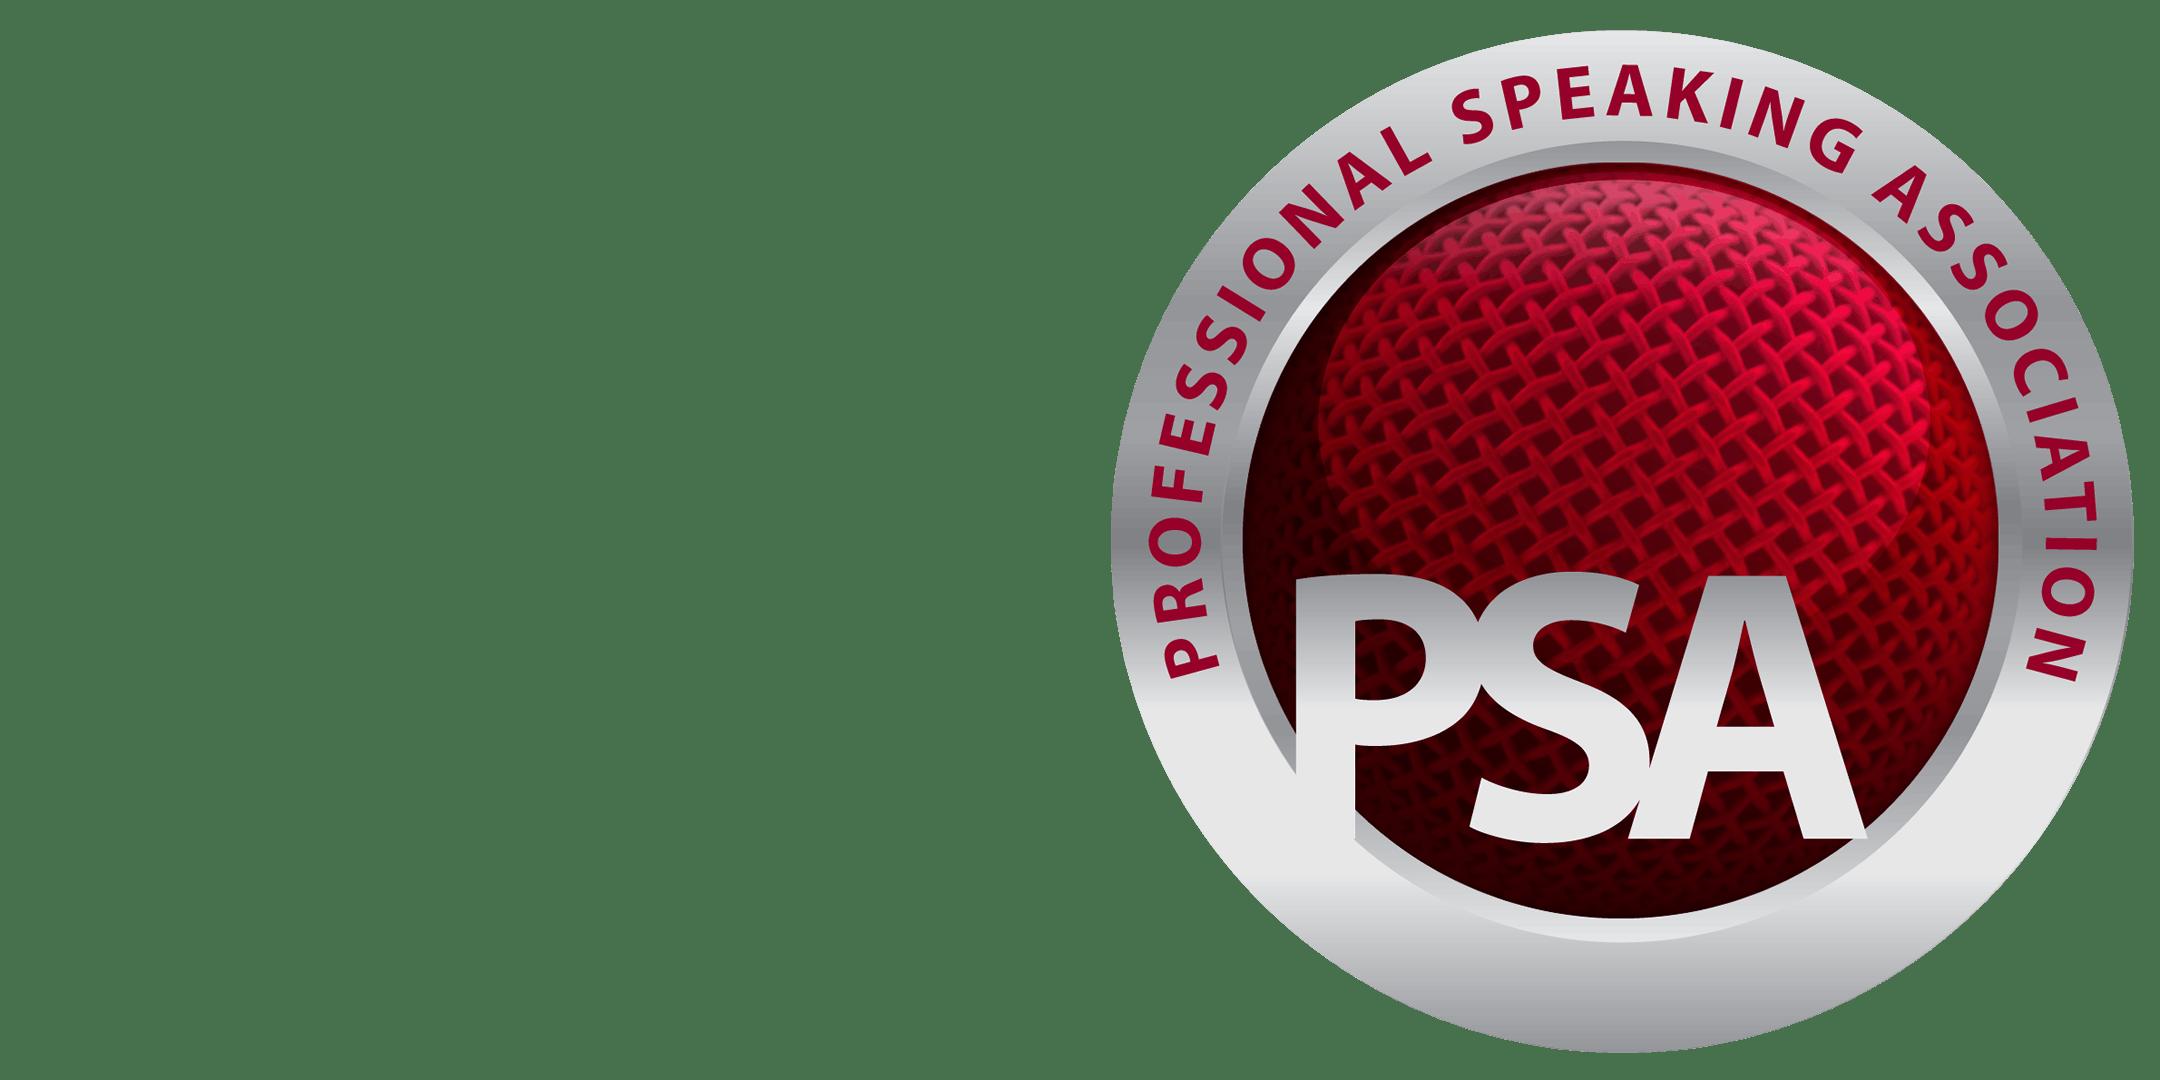 PSA Midlands November - Winning speeches and building ducks